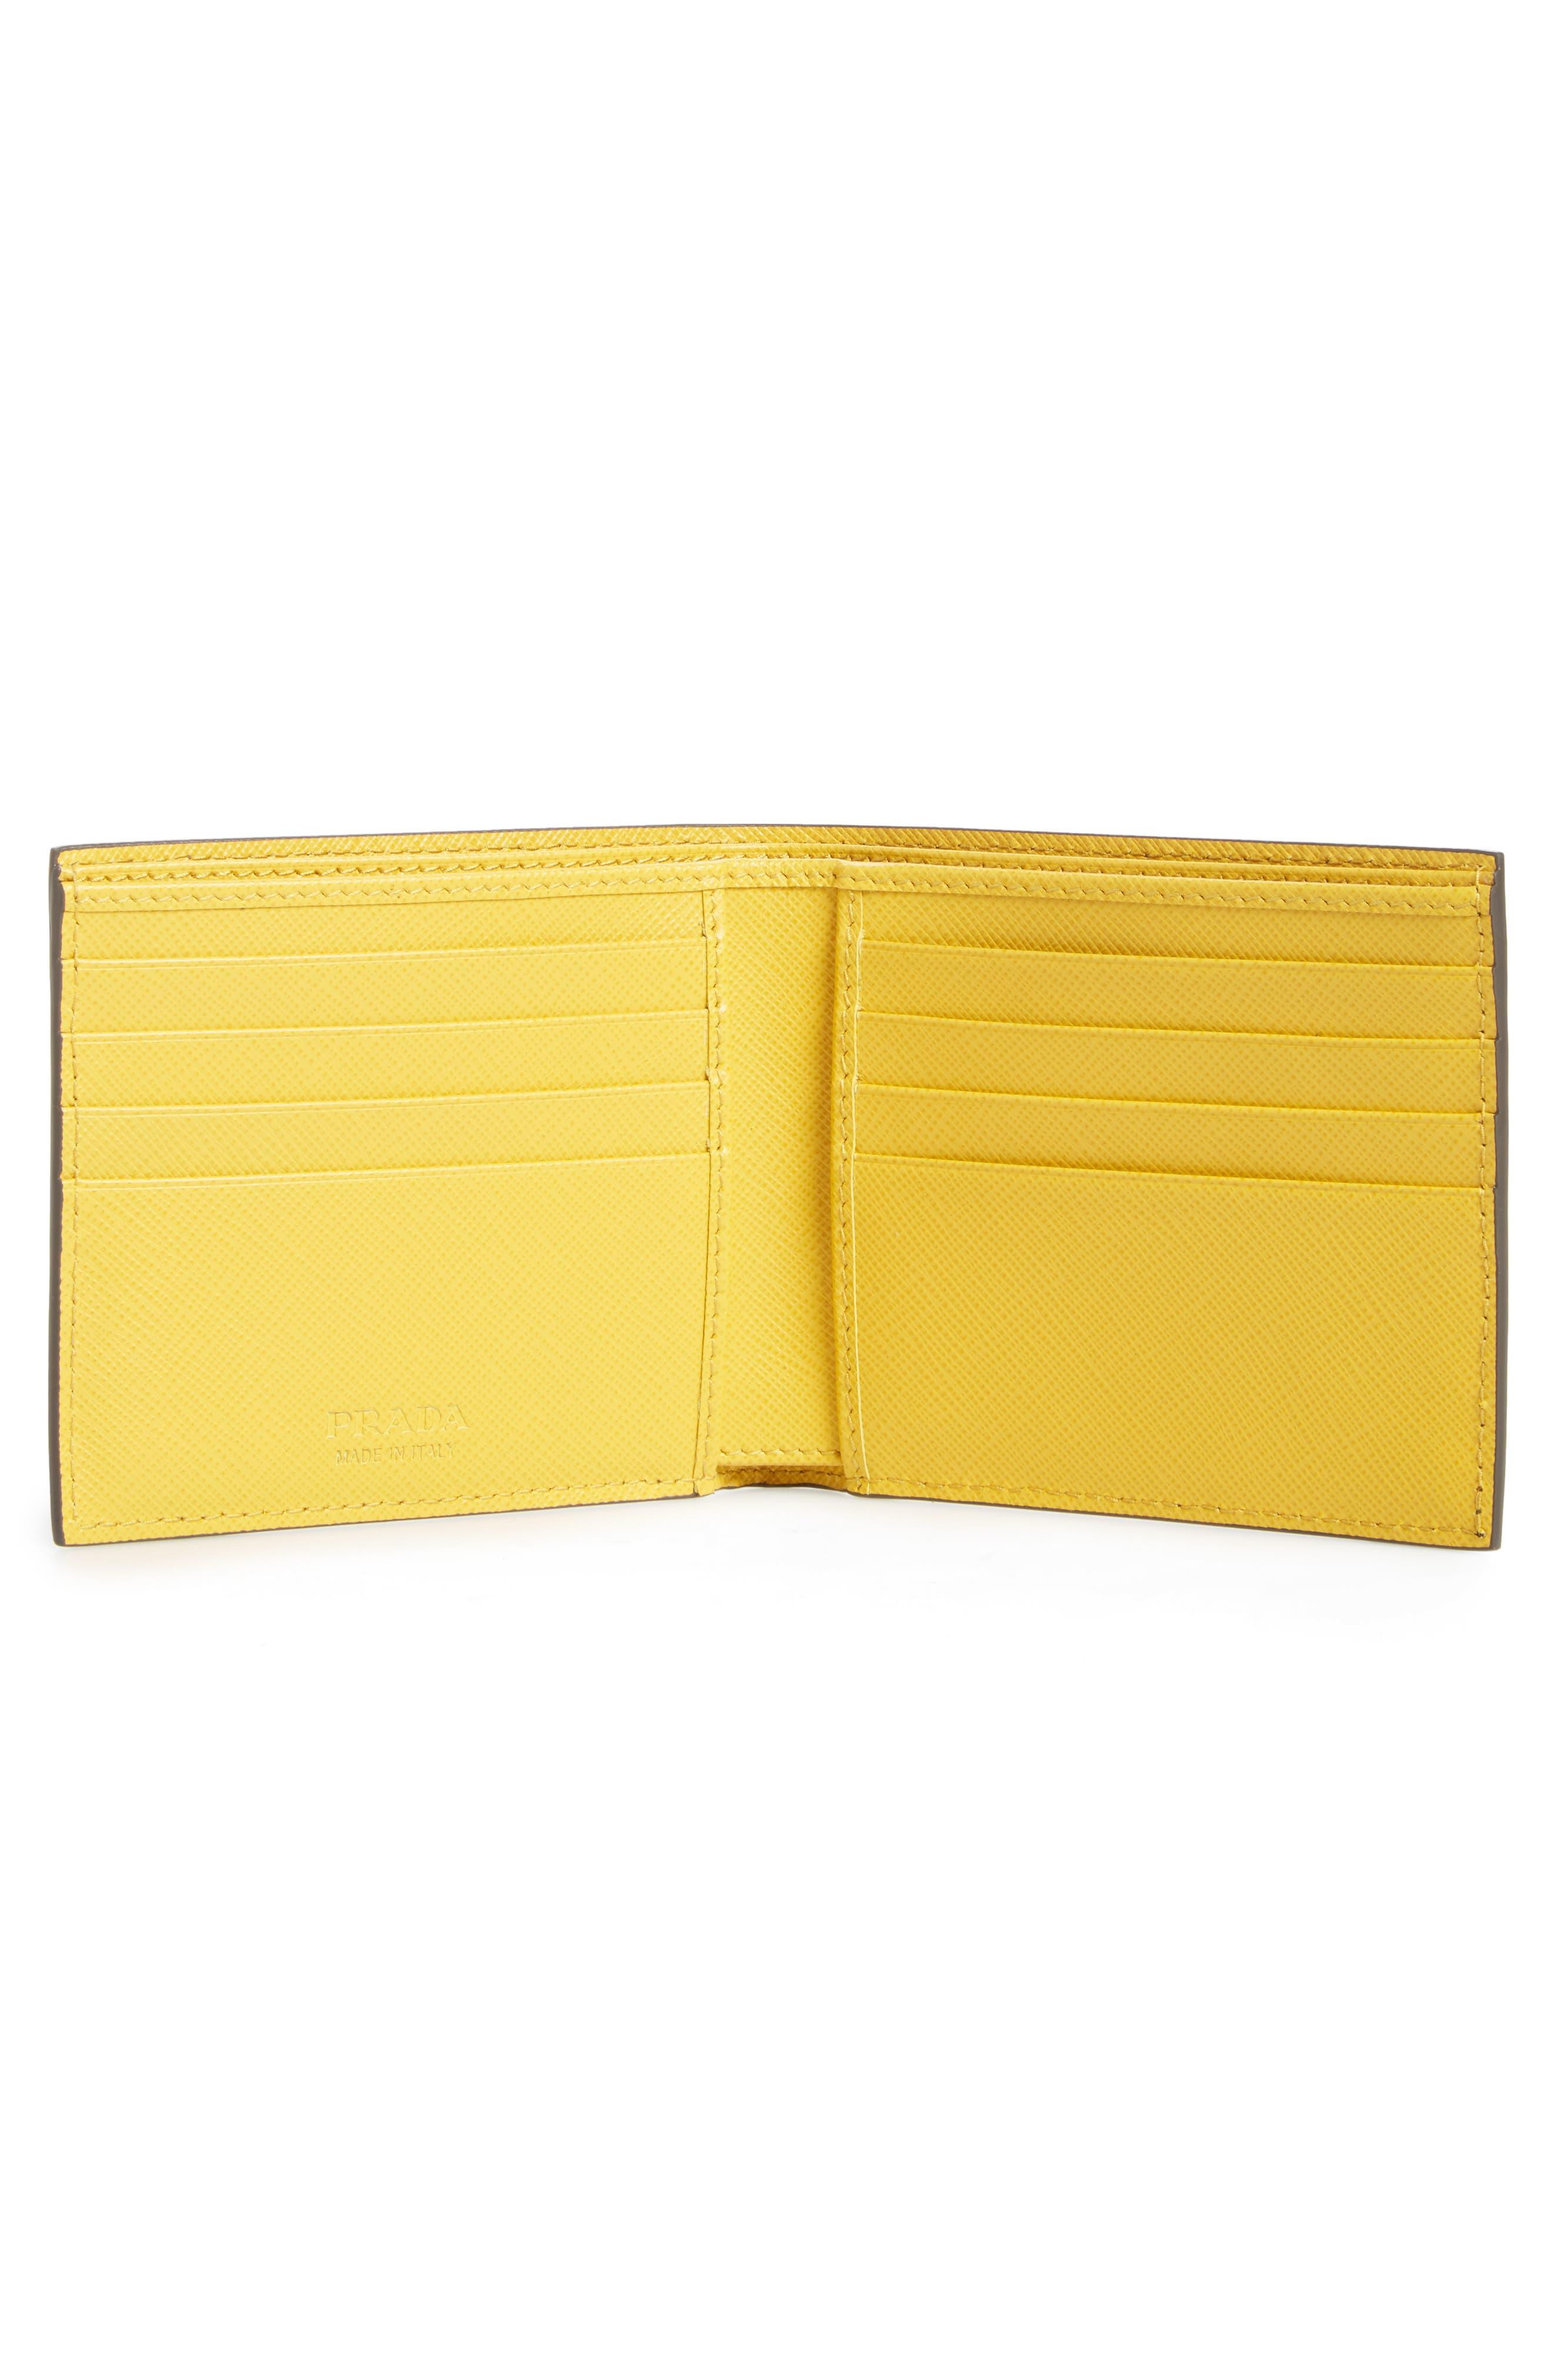 Alternate Image 2  - Prada Bicolor Leather Wallet